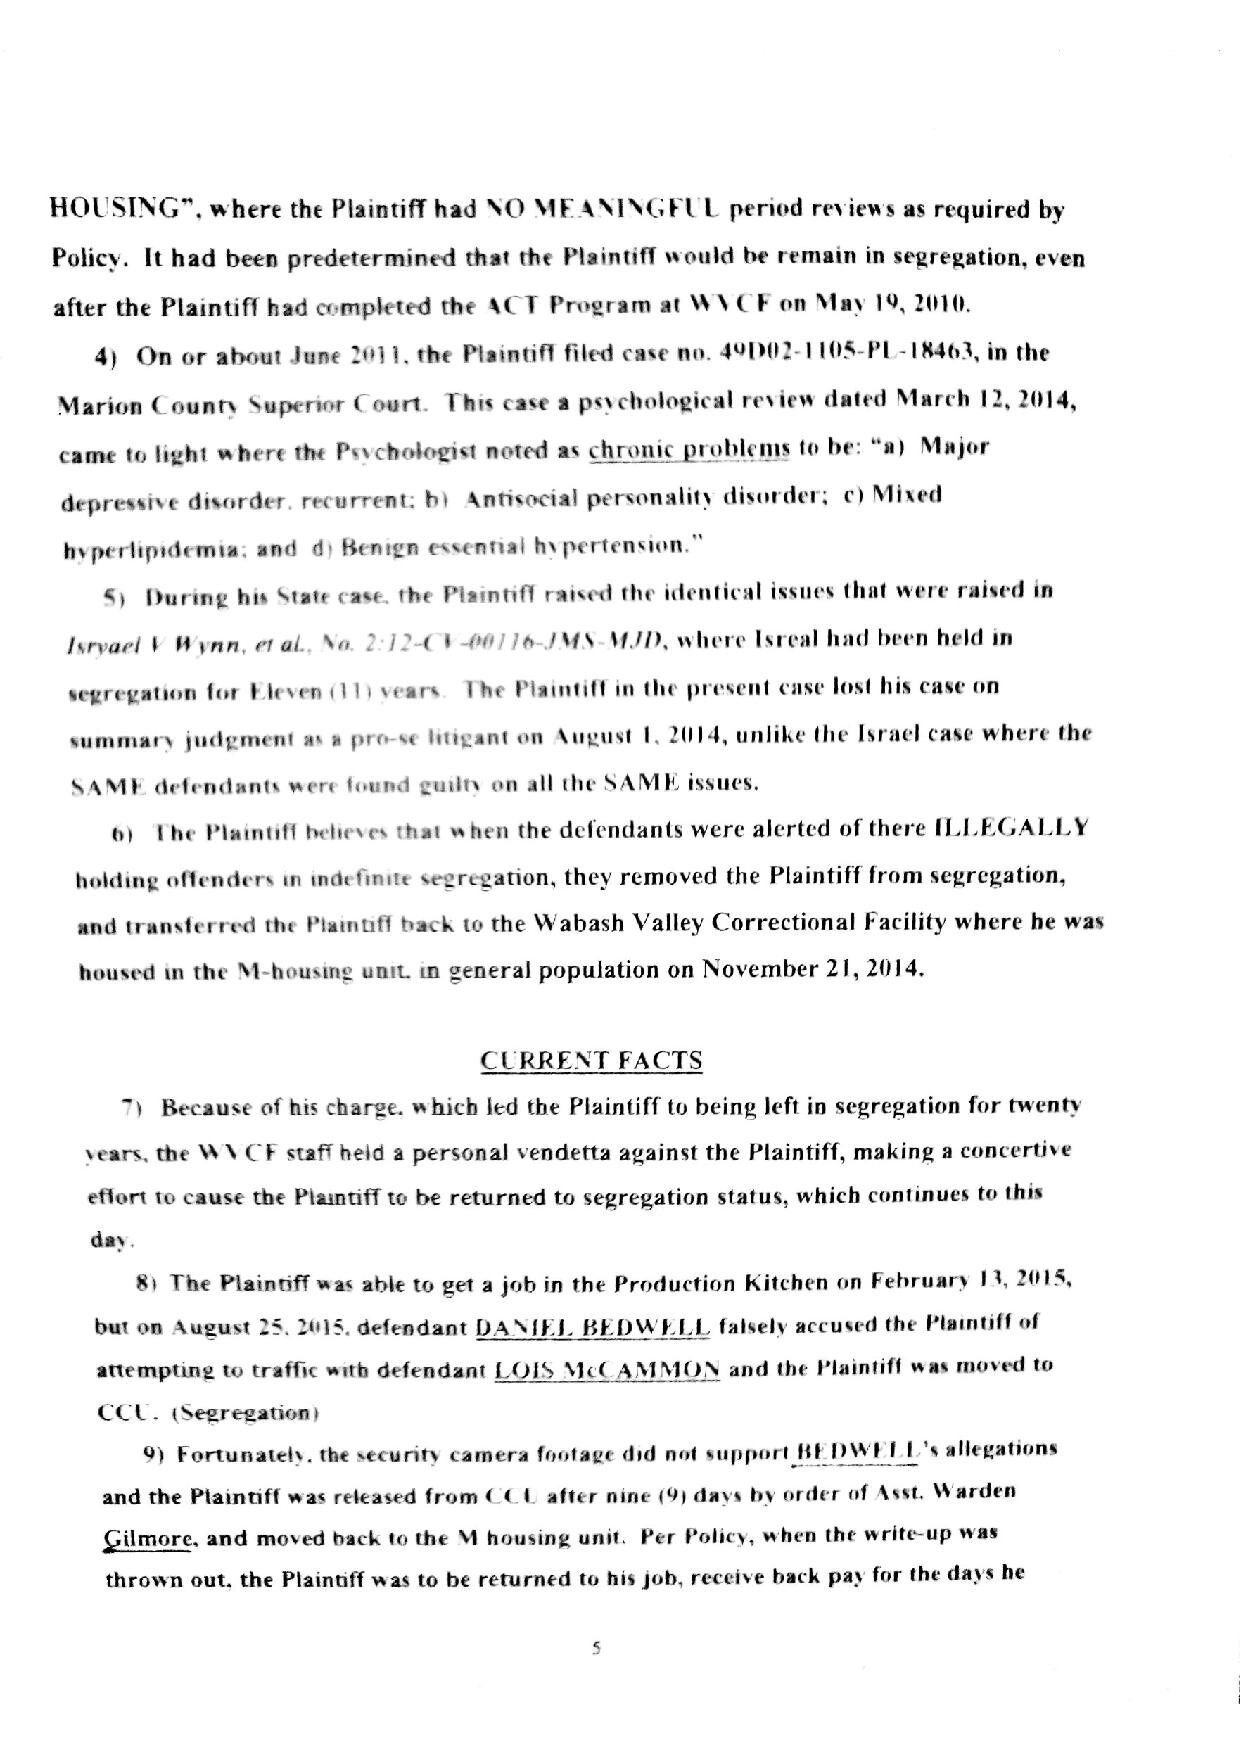 Khalfani lawsuit-page-005.jpg